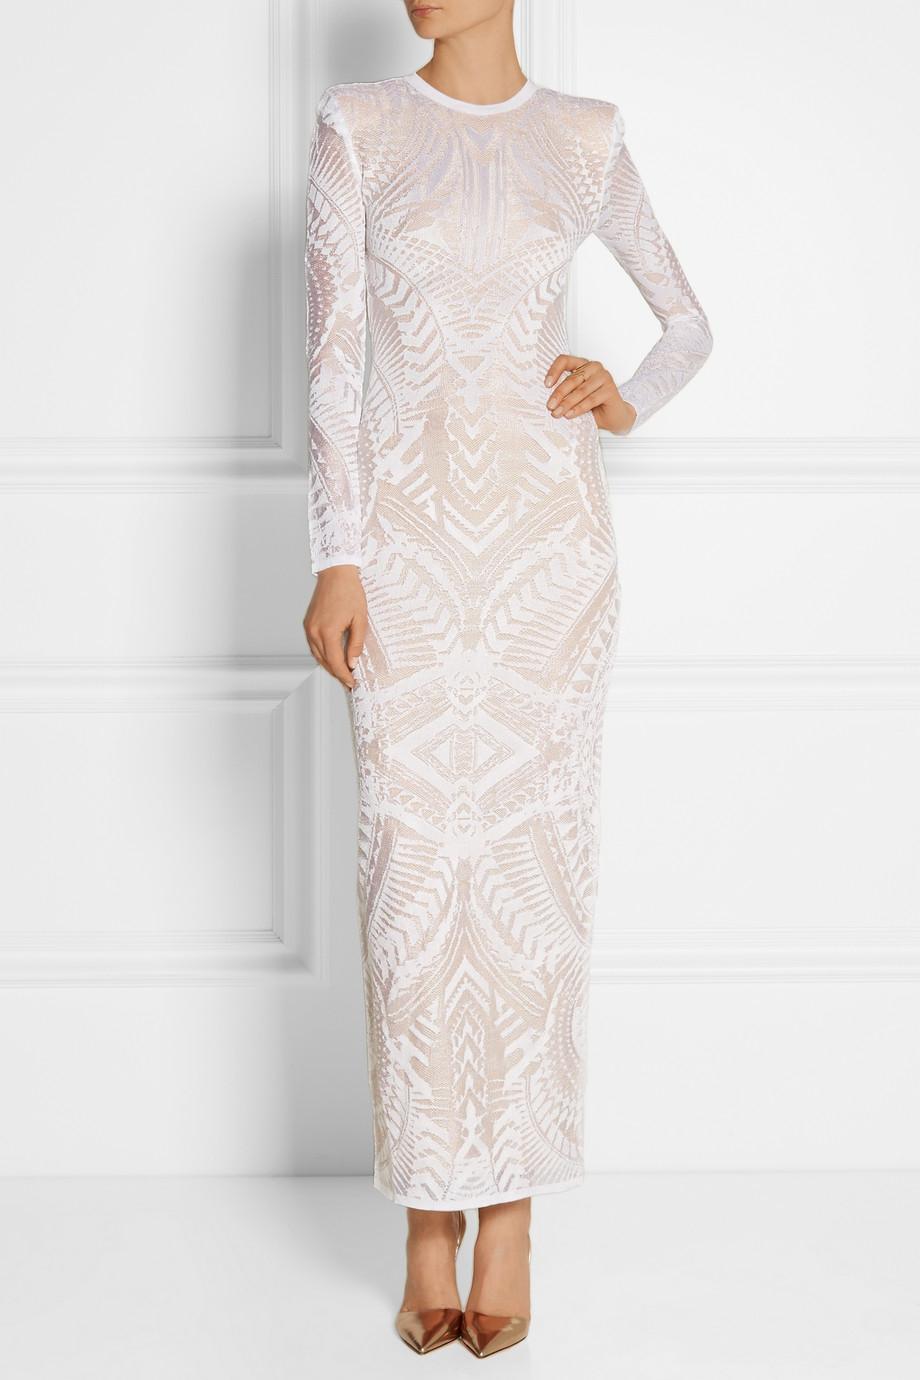 834a9dd8 Balmain Knitted Midi Dress in White - Lyst